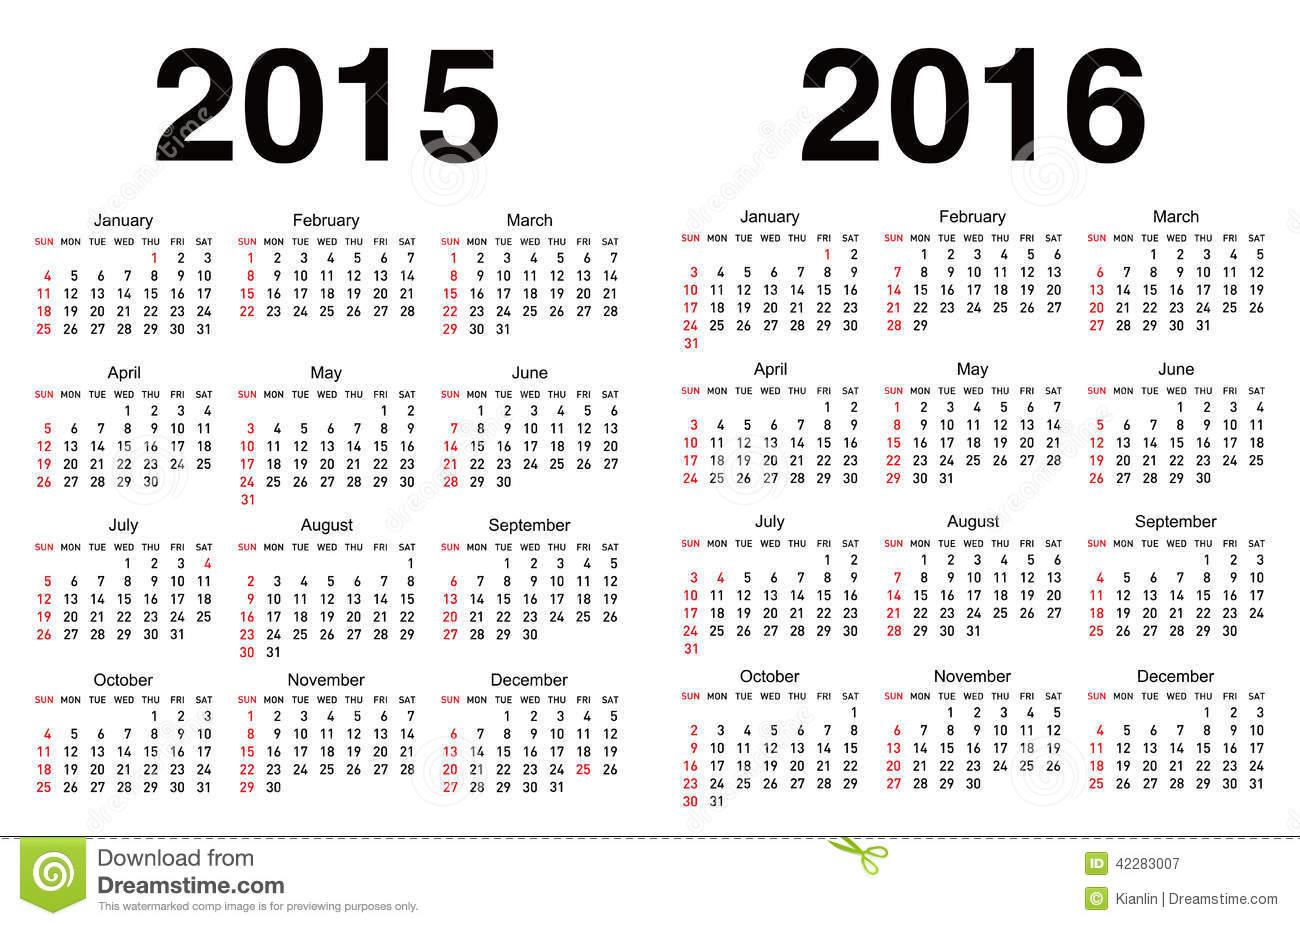 Calendar Templates 2015 2016